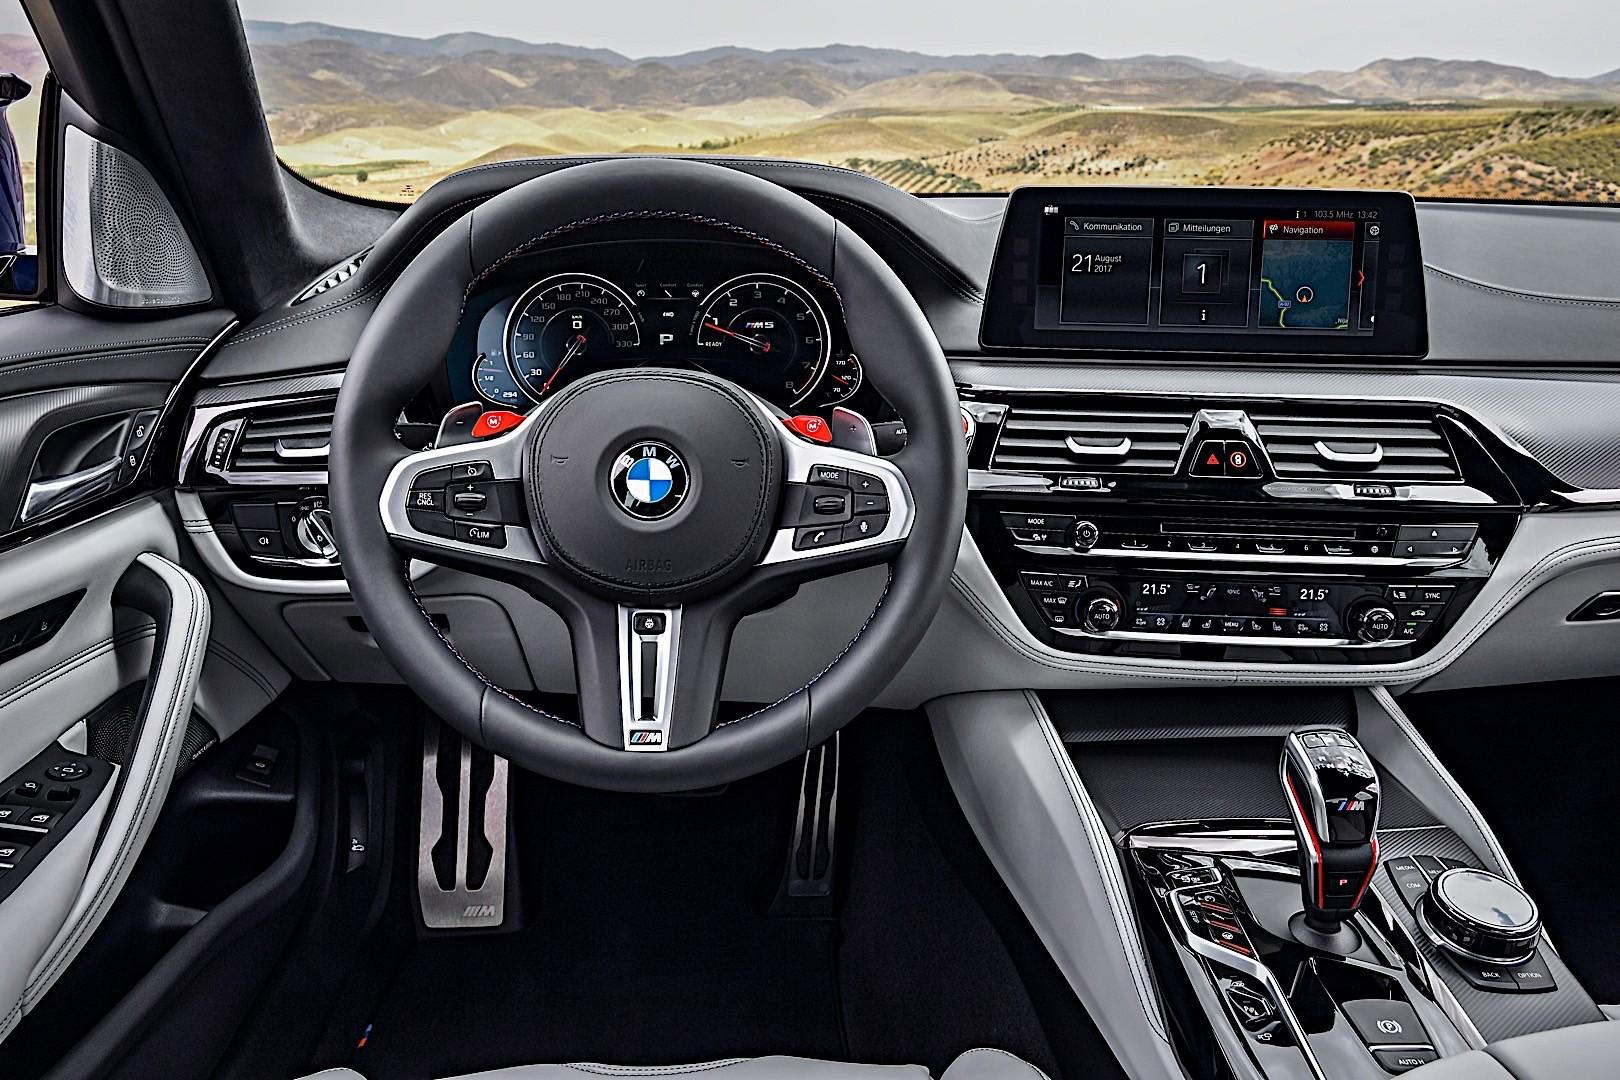 Der neue bmw x3 m und bmw x4 m. BMW M5 (F90) specs & photos - 2017, 2018, 2019, 2020